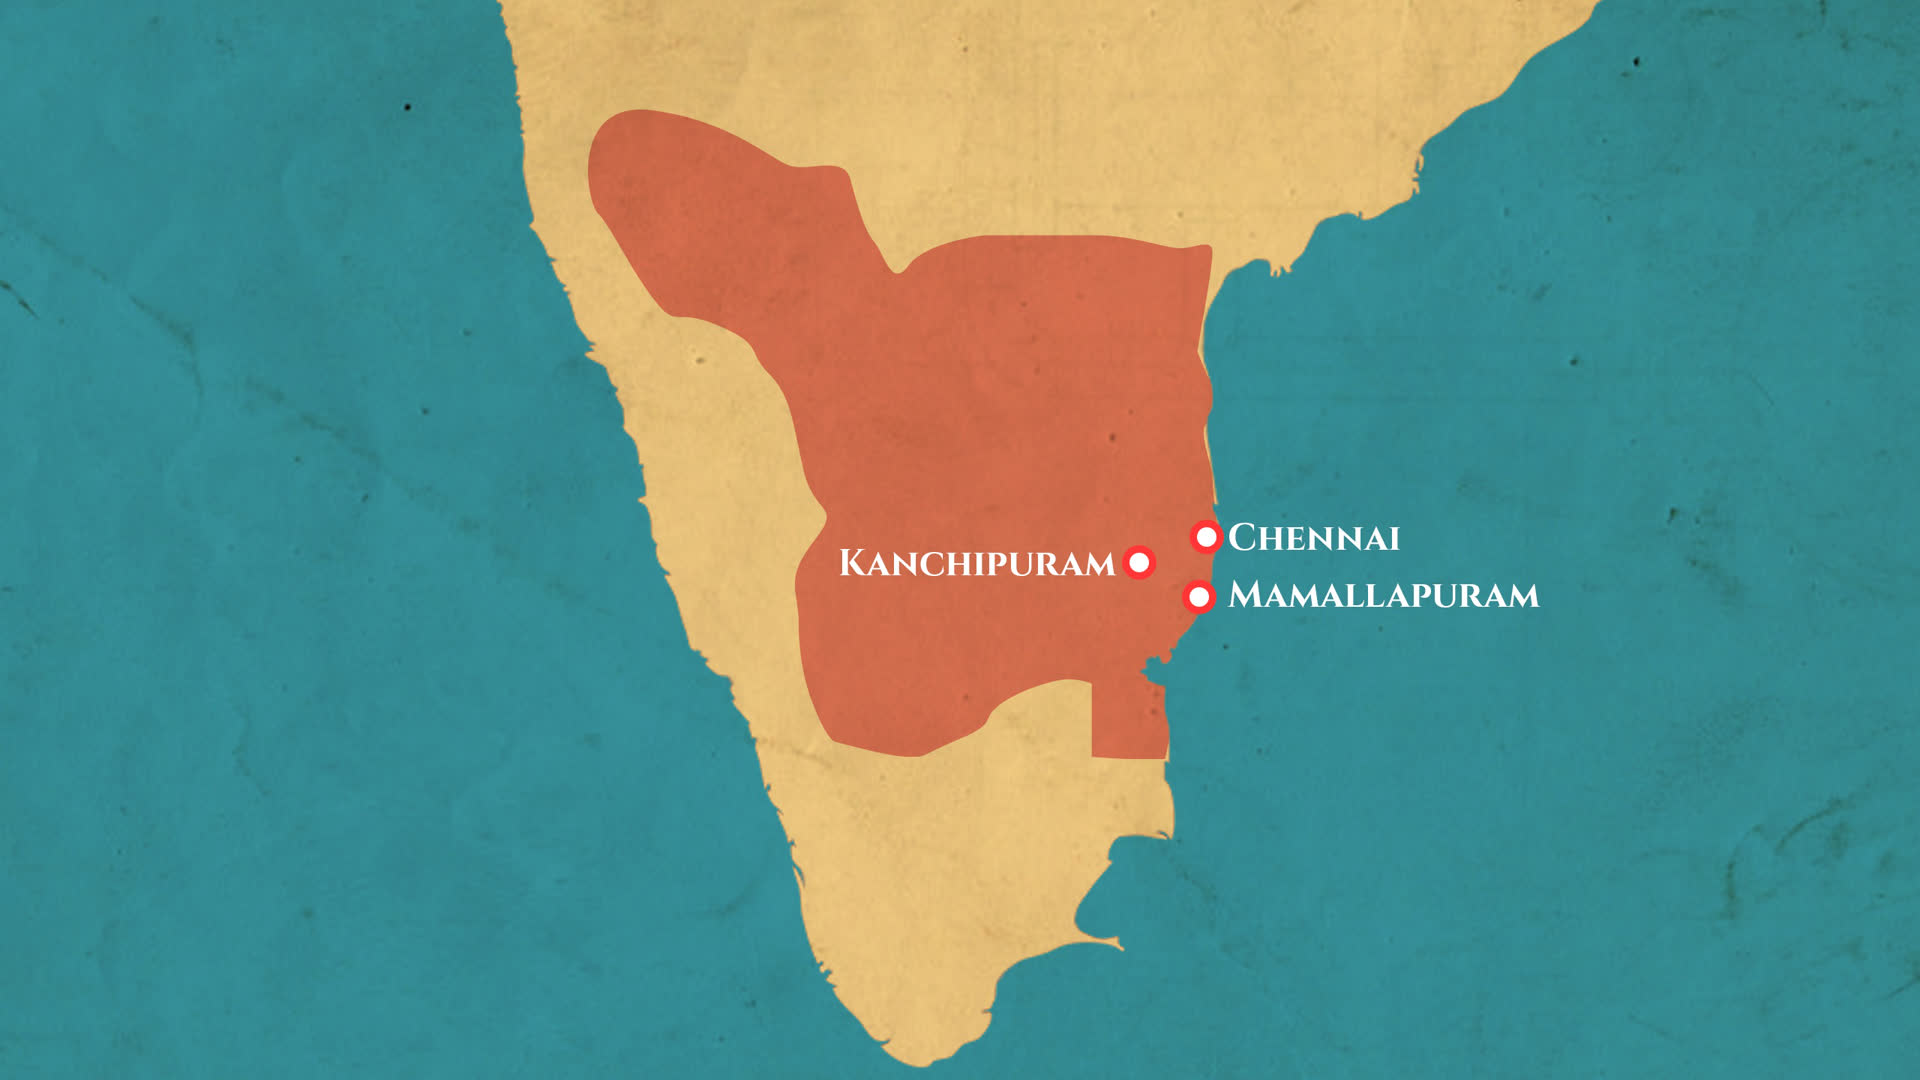 Extent of the Pallava Empire c. 645 CE | LHI